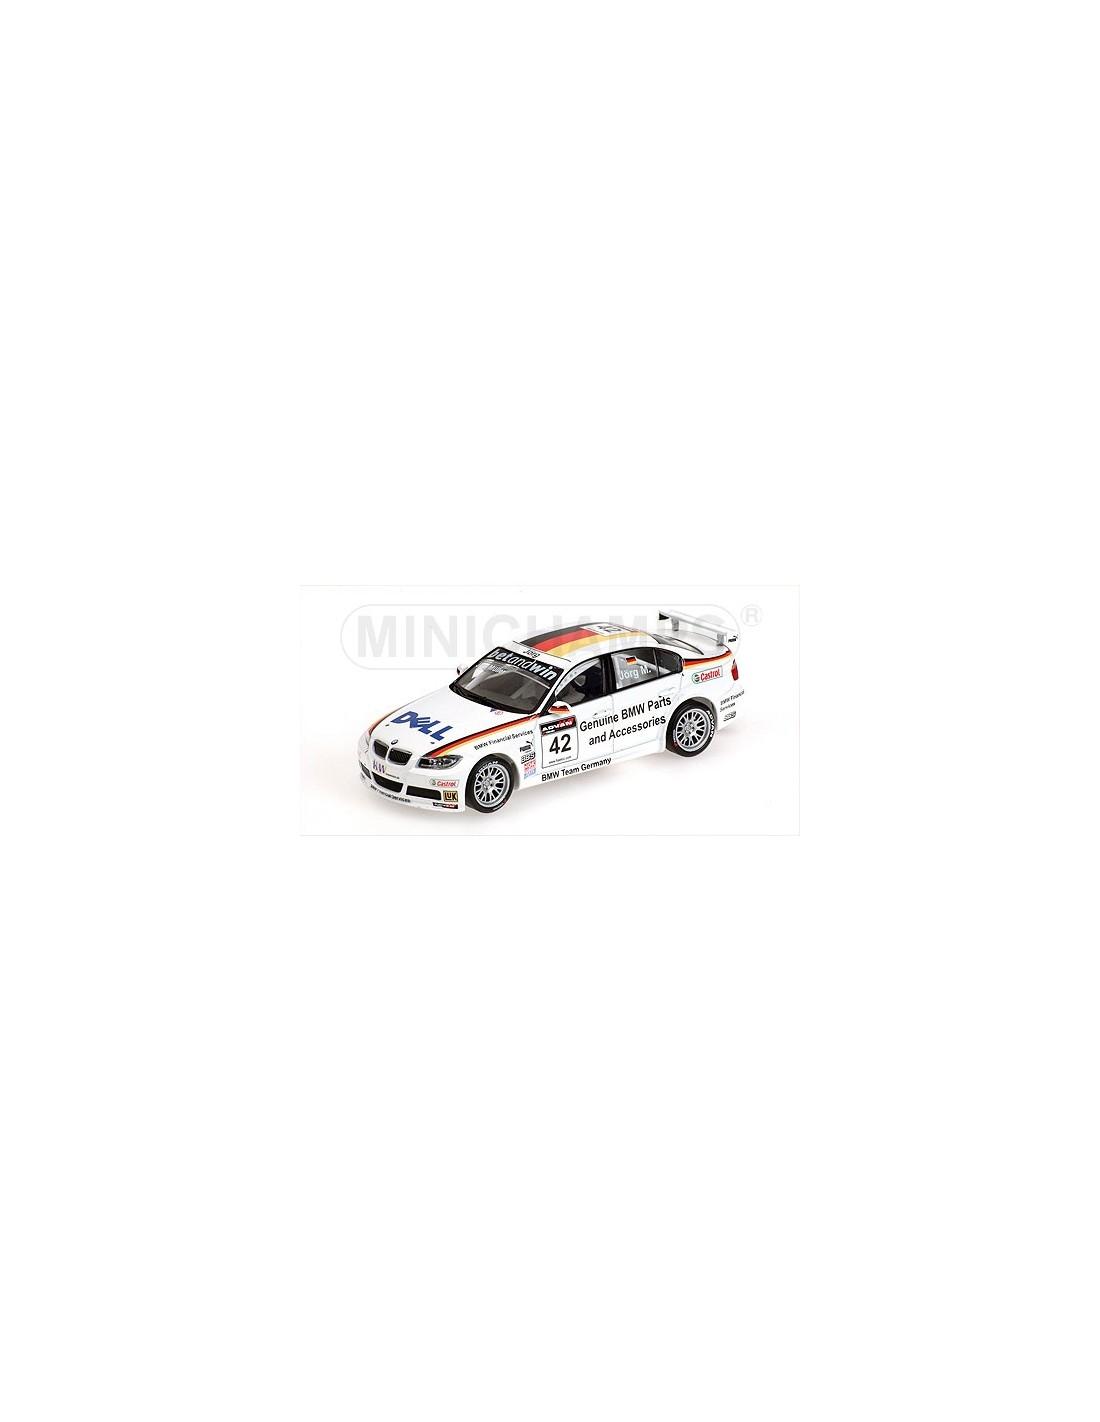 438 Minich s Audi R8 400051301 further 2445 Minich s Porsche 997 437086121 also 60736 Modellino Mclaren Mercedes Mp424 H Kovalainen 2009 Metallo Minich s 4012138097278 moreover Ox76xk001 176 Jaguar Xk furthermore 1208 Minich s Bmw 400062642. on revell 1 43 diecast cars